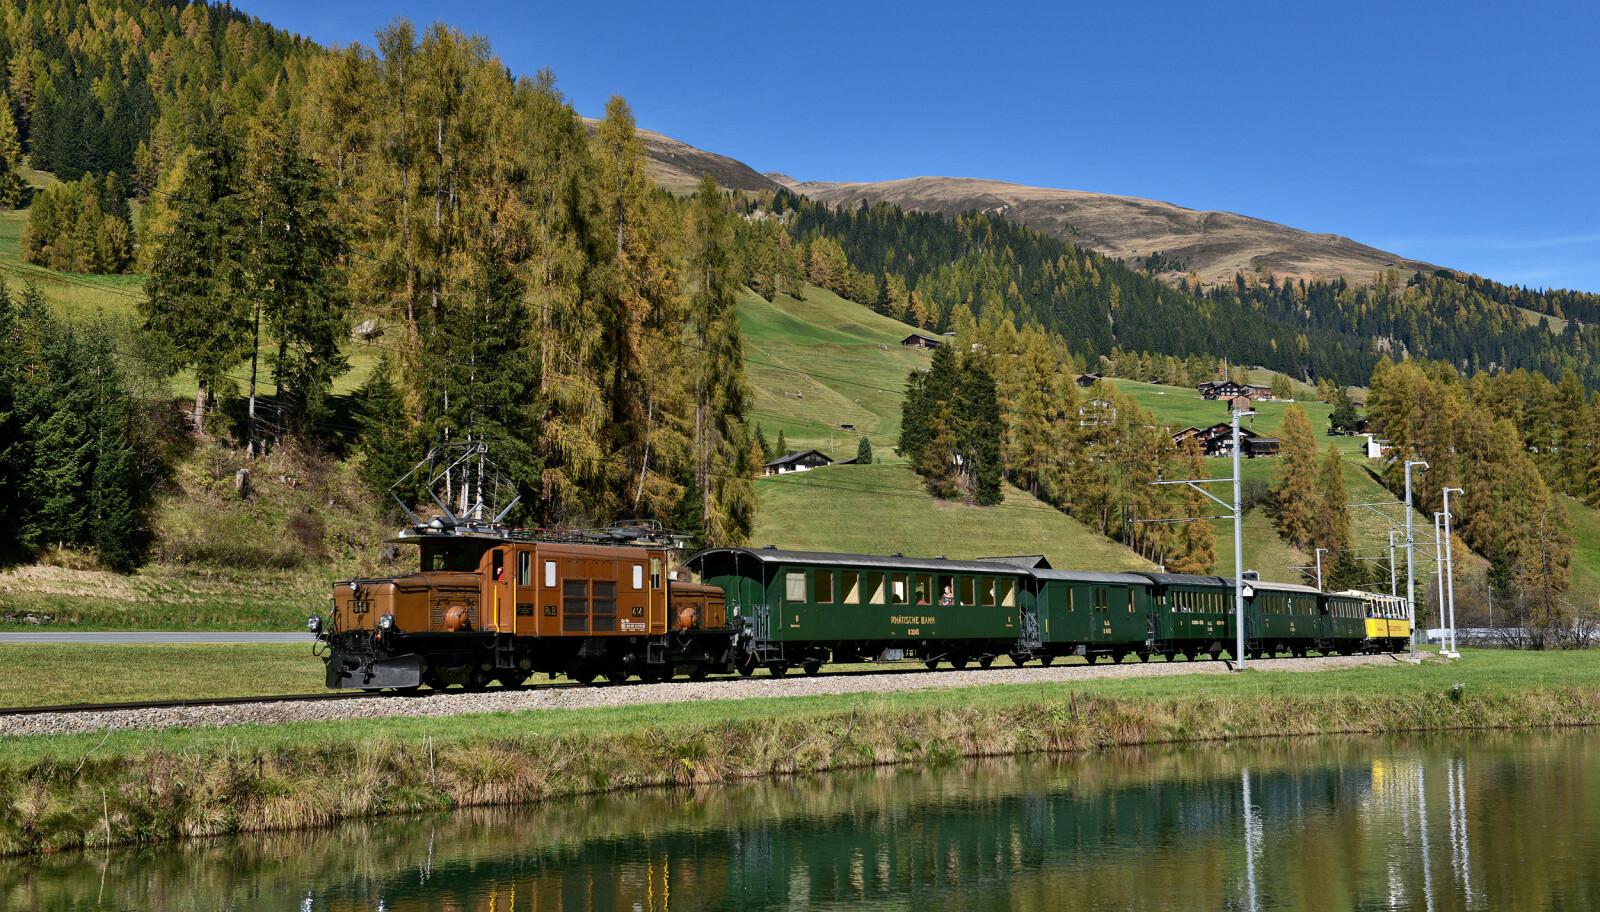 <b>KROKODILLE_LOKOMOTIV:</b> De legendariske lokomotivene har vært i tjeneste siden 1929.